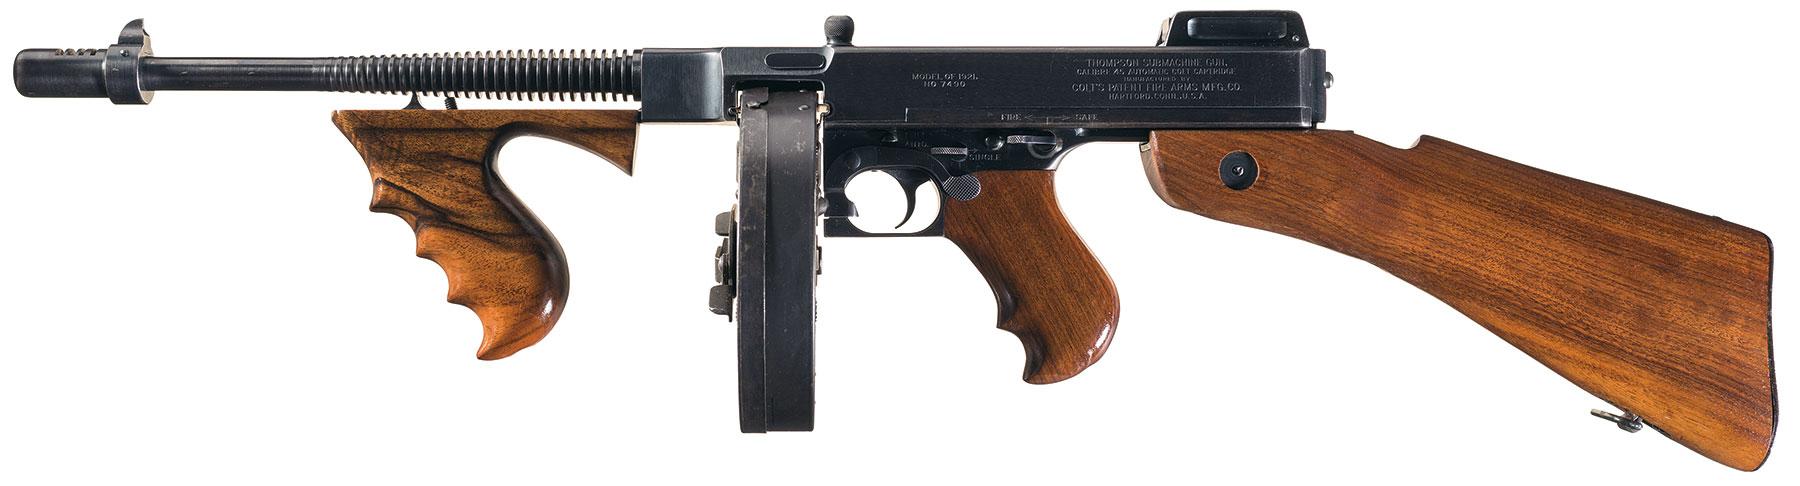 Colt 1921 Thompson Fully Transferrable Sub-Machine Gun